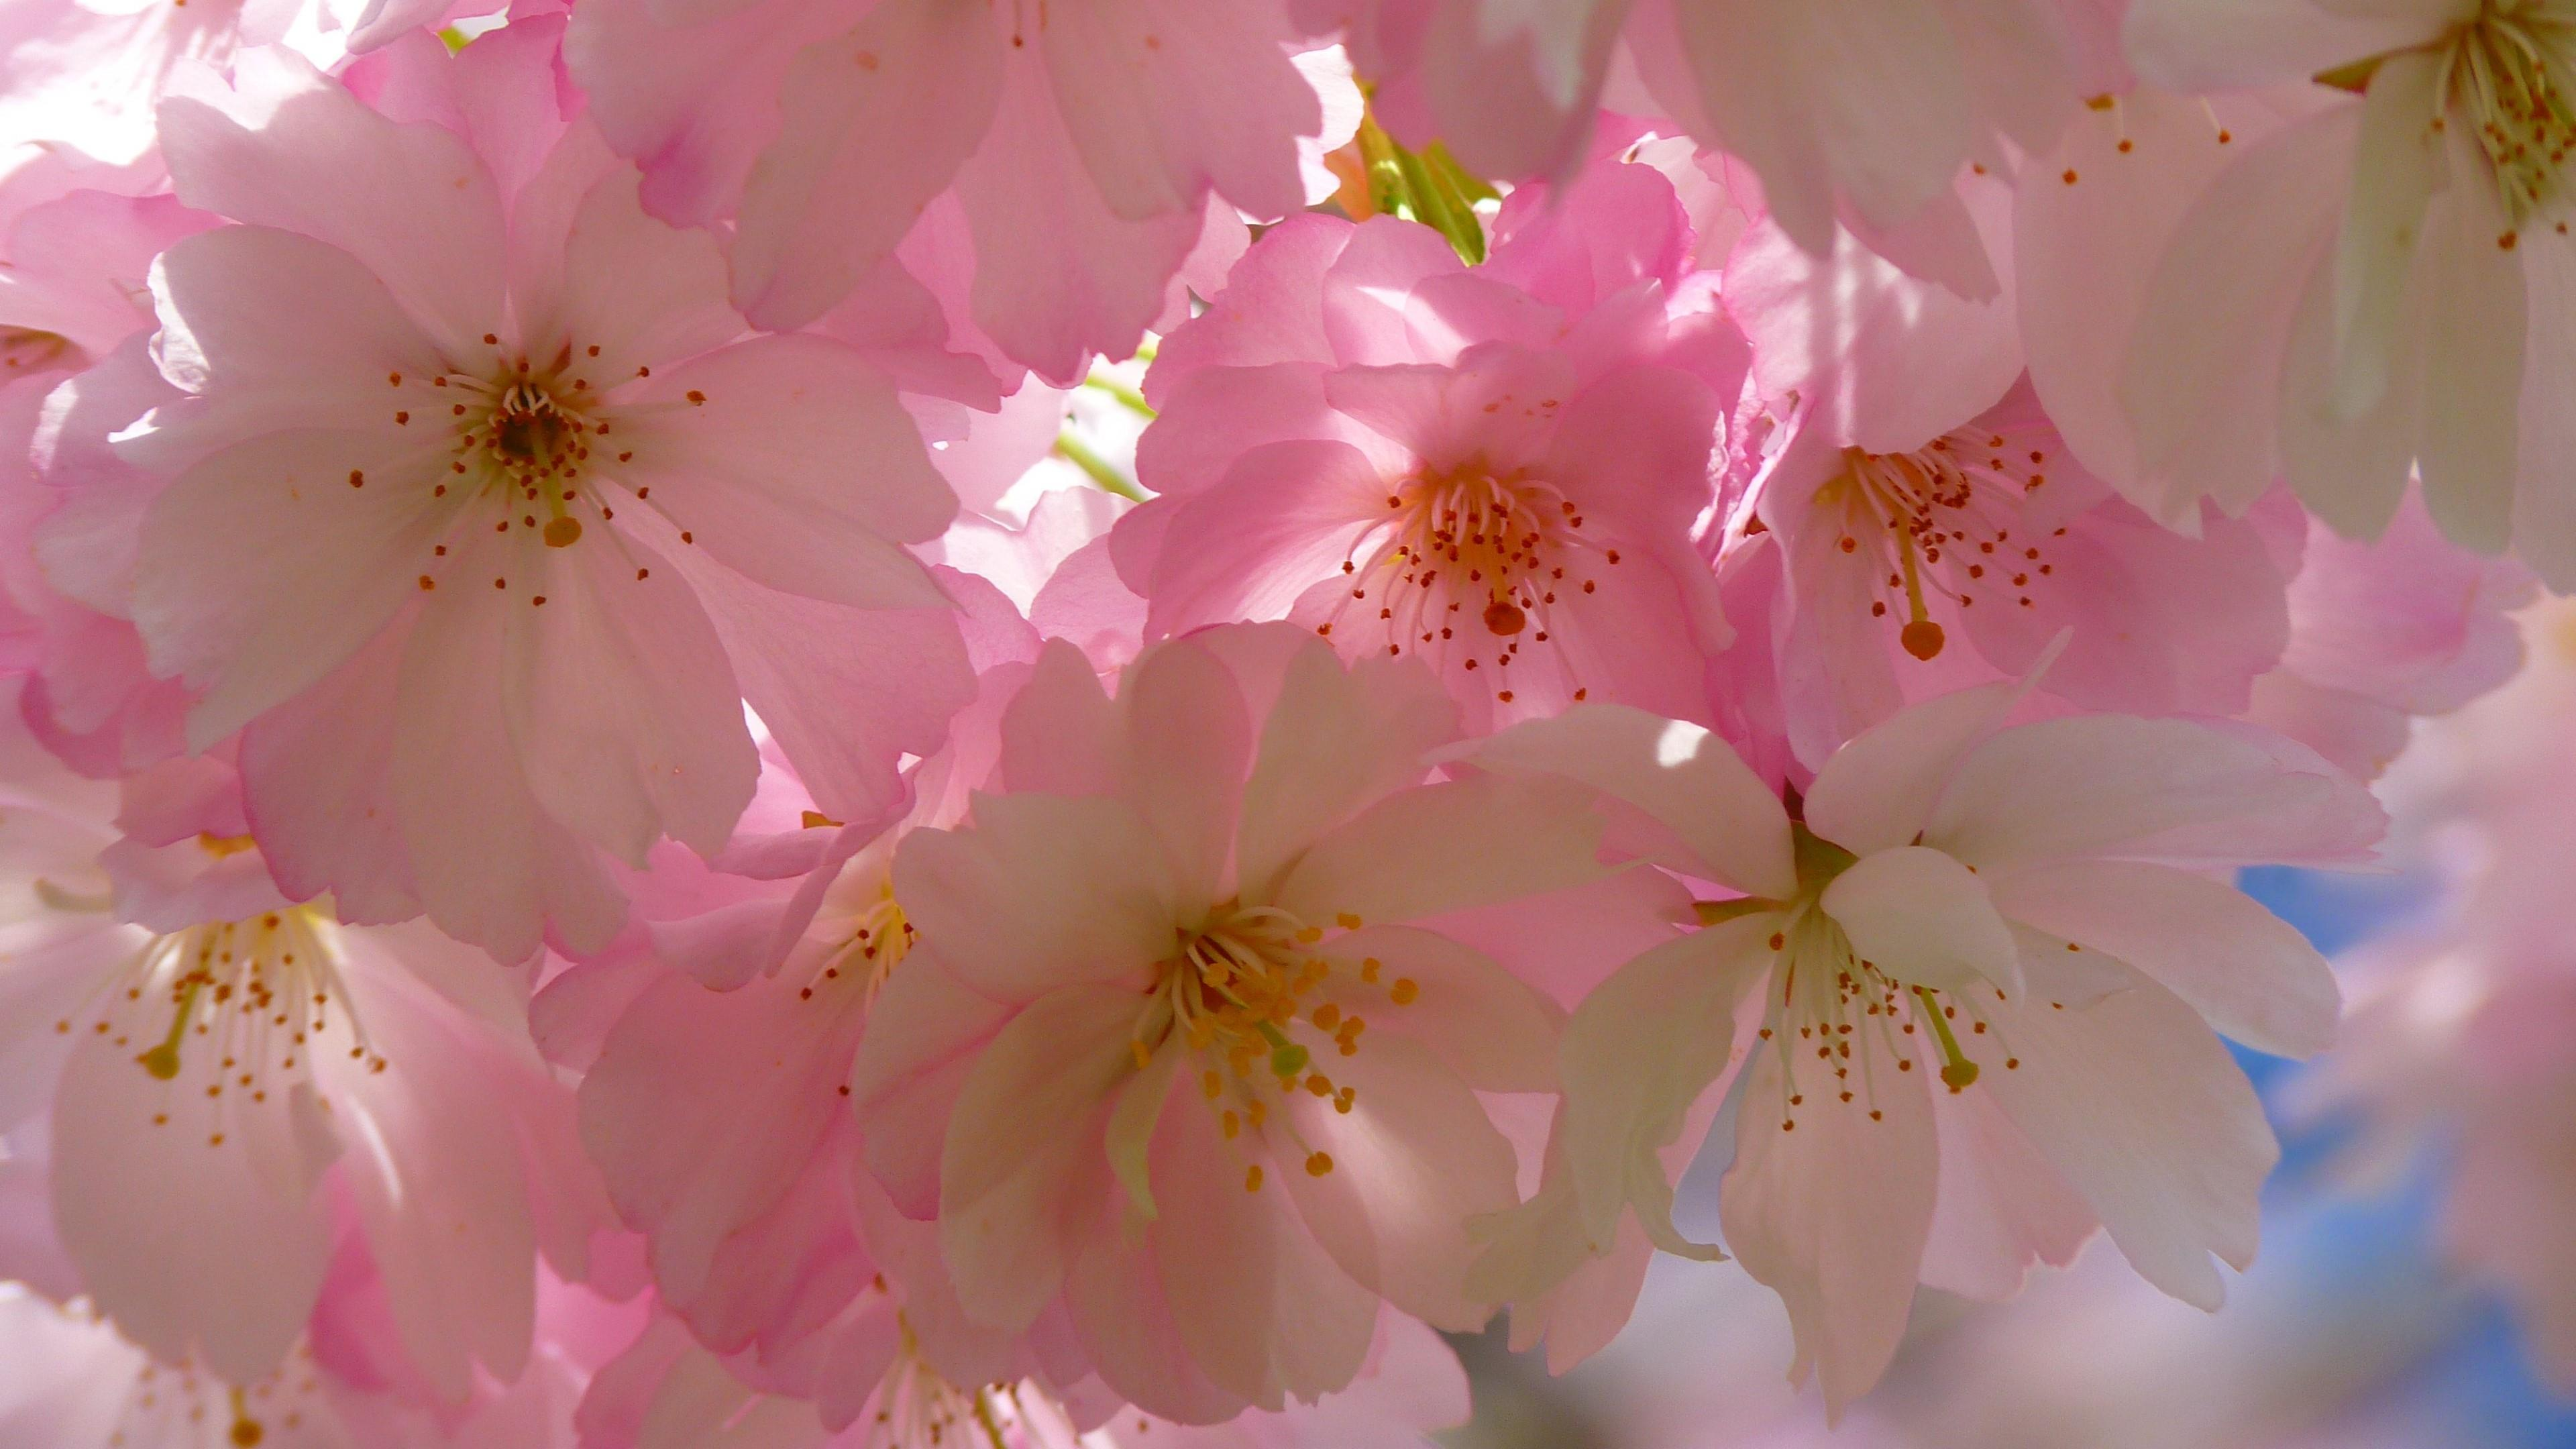 Cherry blossom at spring  wallpaper